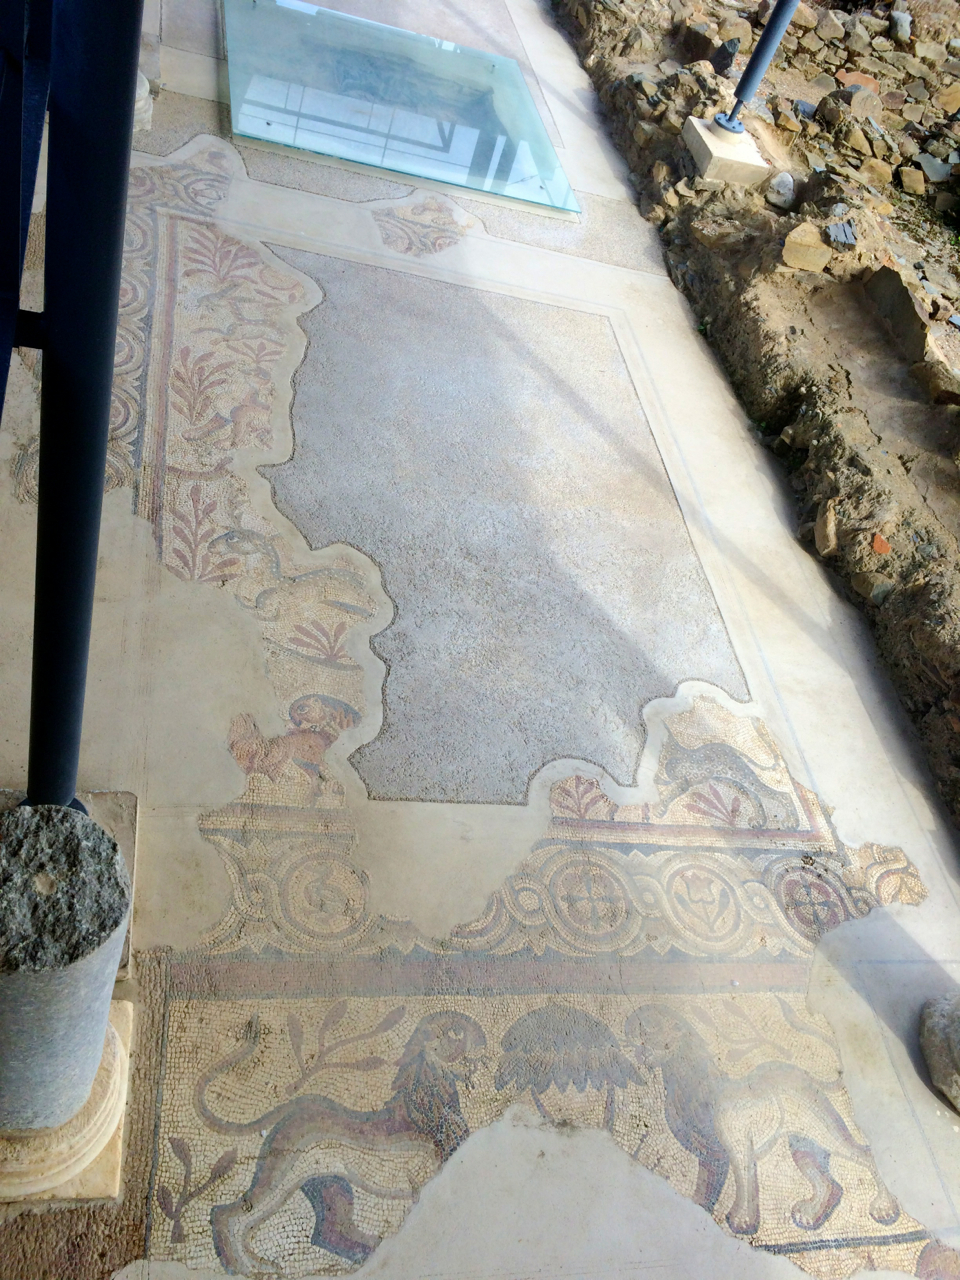 Oh hey, no biggie, just some 5th century Roman mosaics.